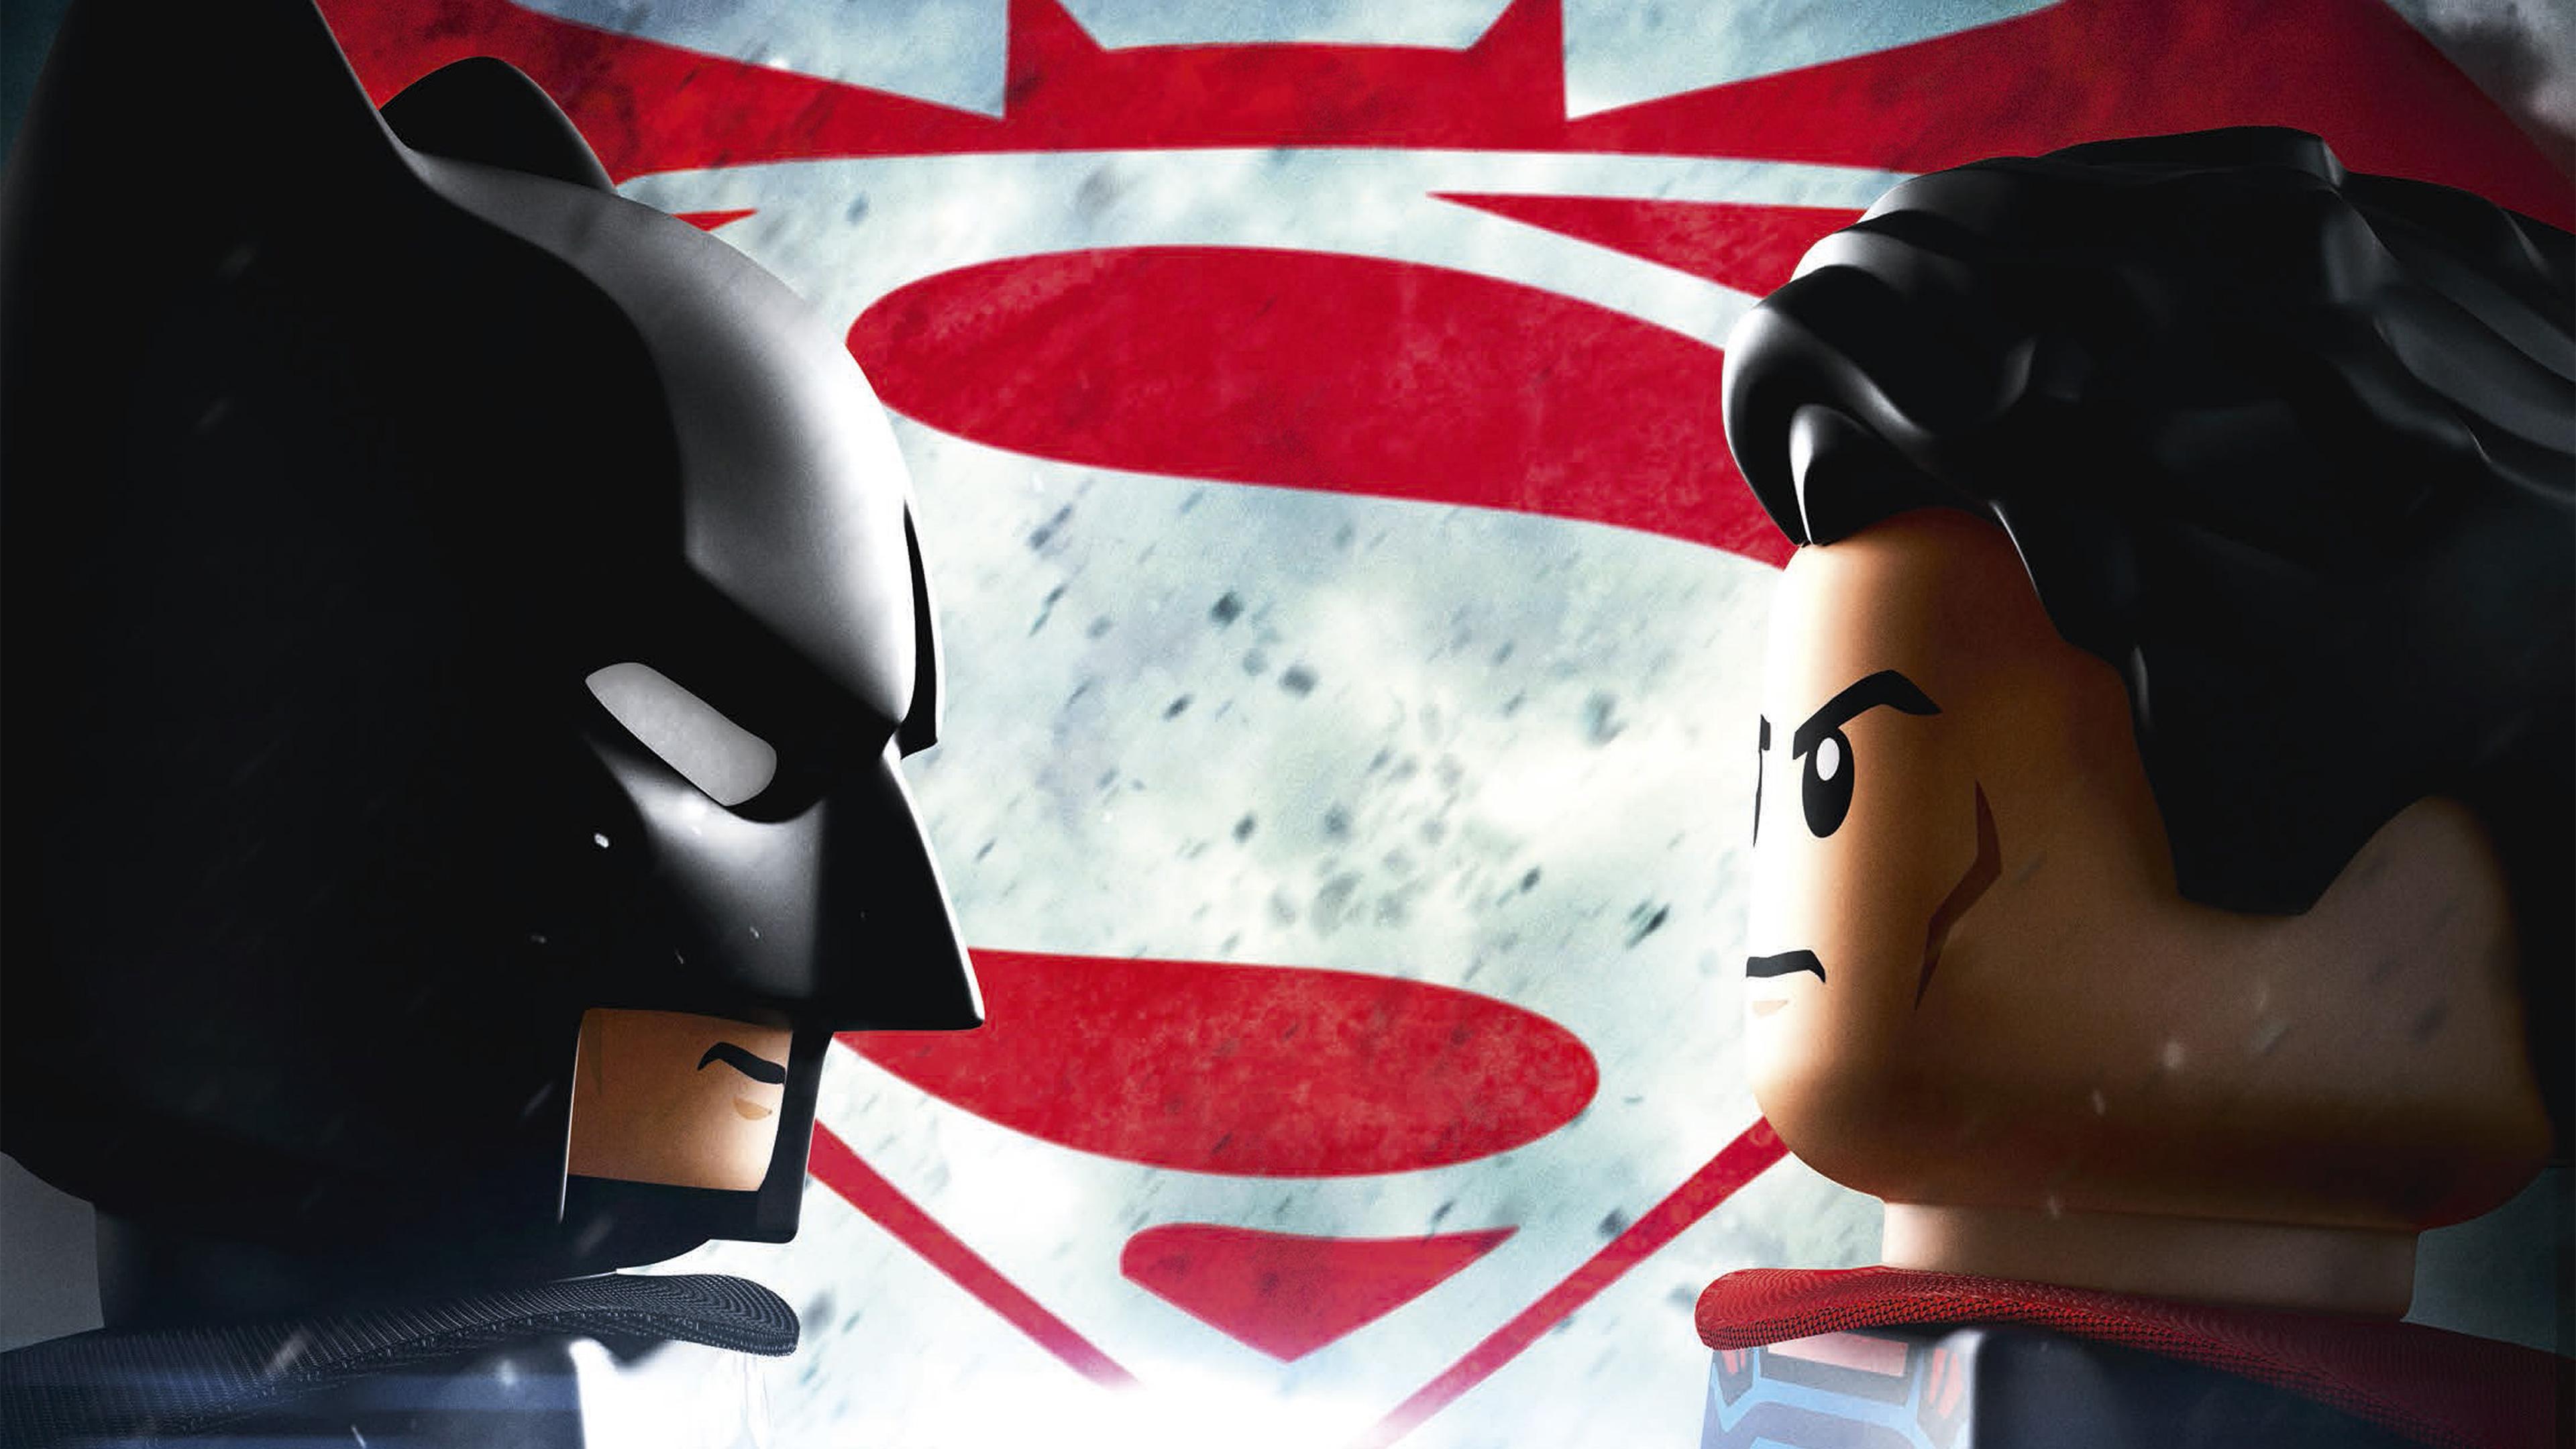 batman v superman lego 2016 1536399791 - Batman V Superman Lego 2016 - super heroes wallpapers, lego wallpapers, batman vs superman wallpapers